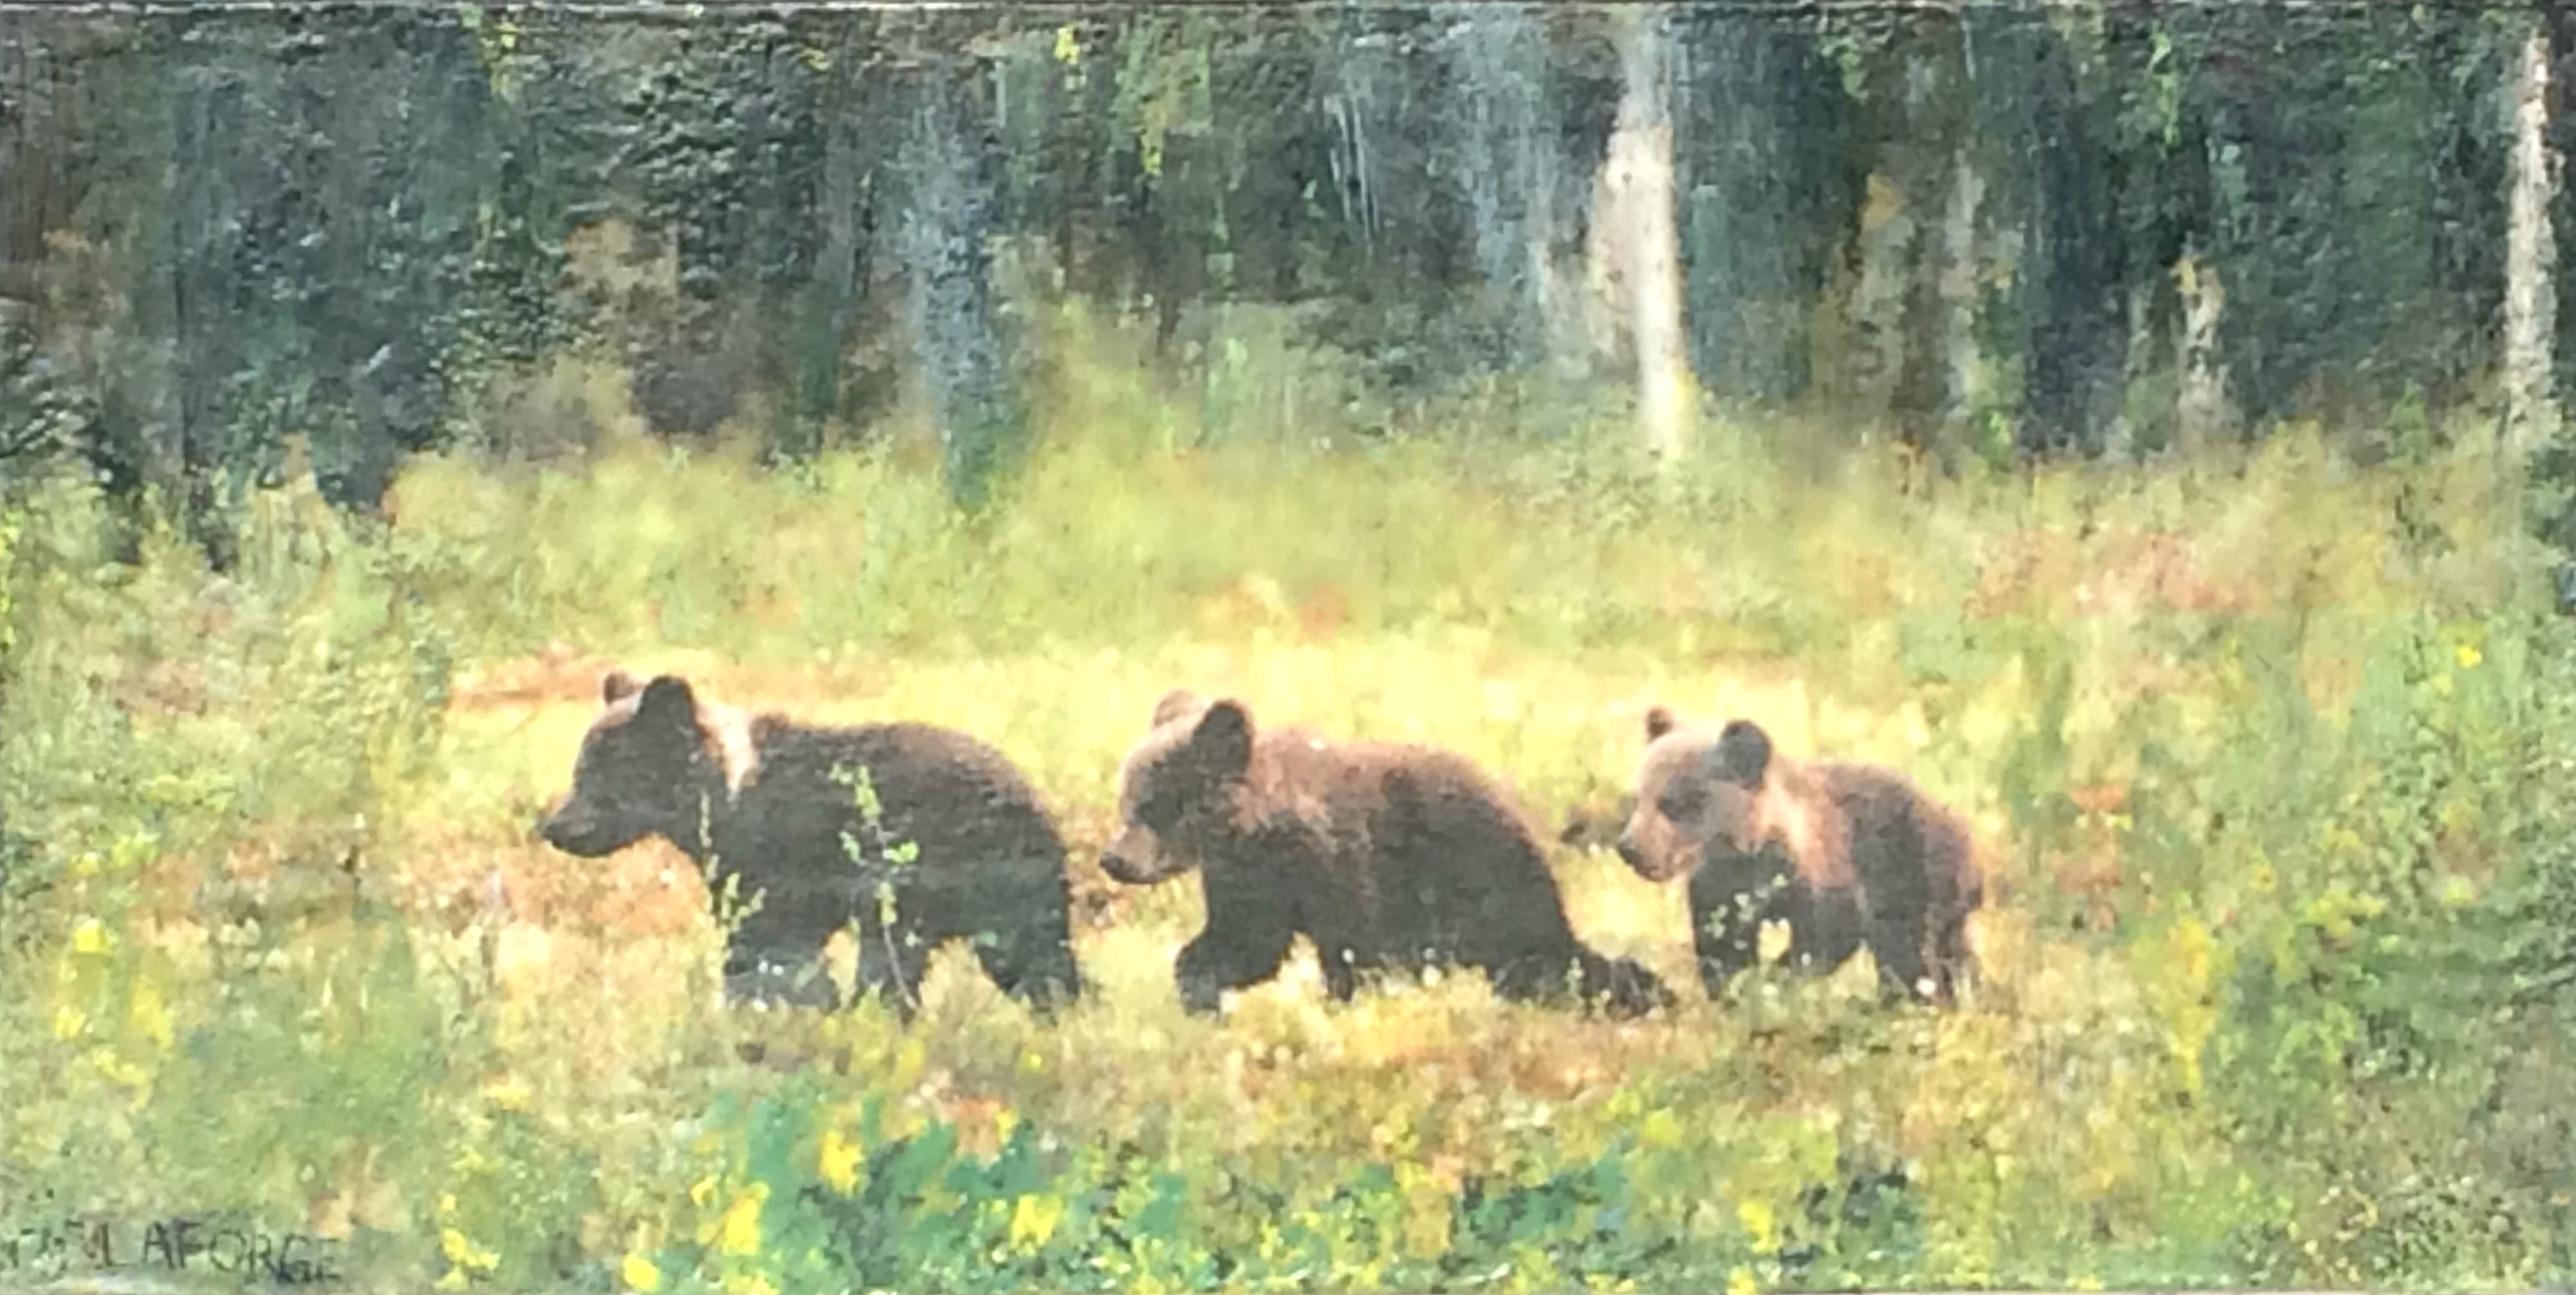 LaForge.The Three Little Bears